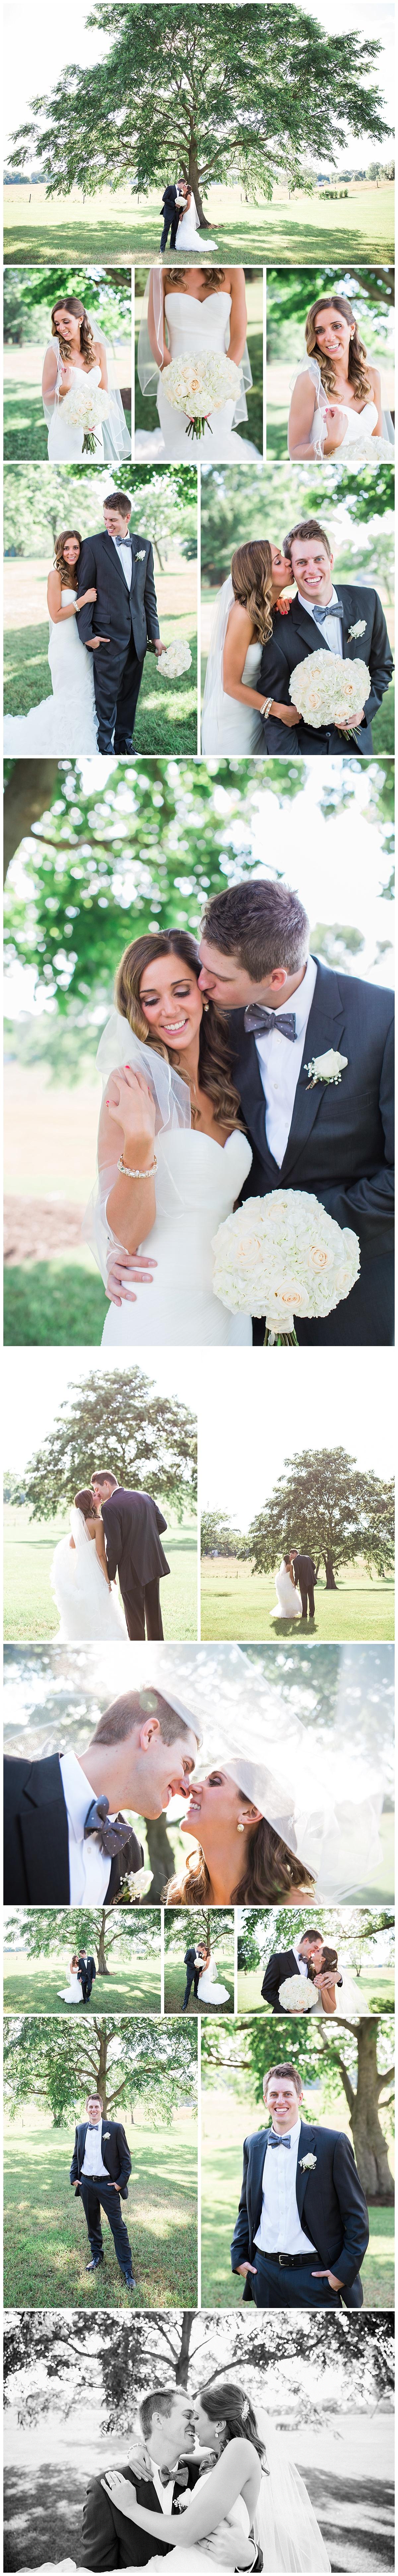 CLEVELAND-WEDDING-PHOTOGRAPHER_0105.jpg